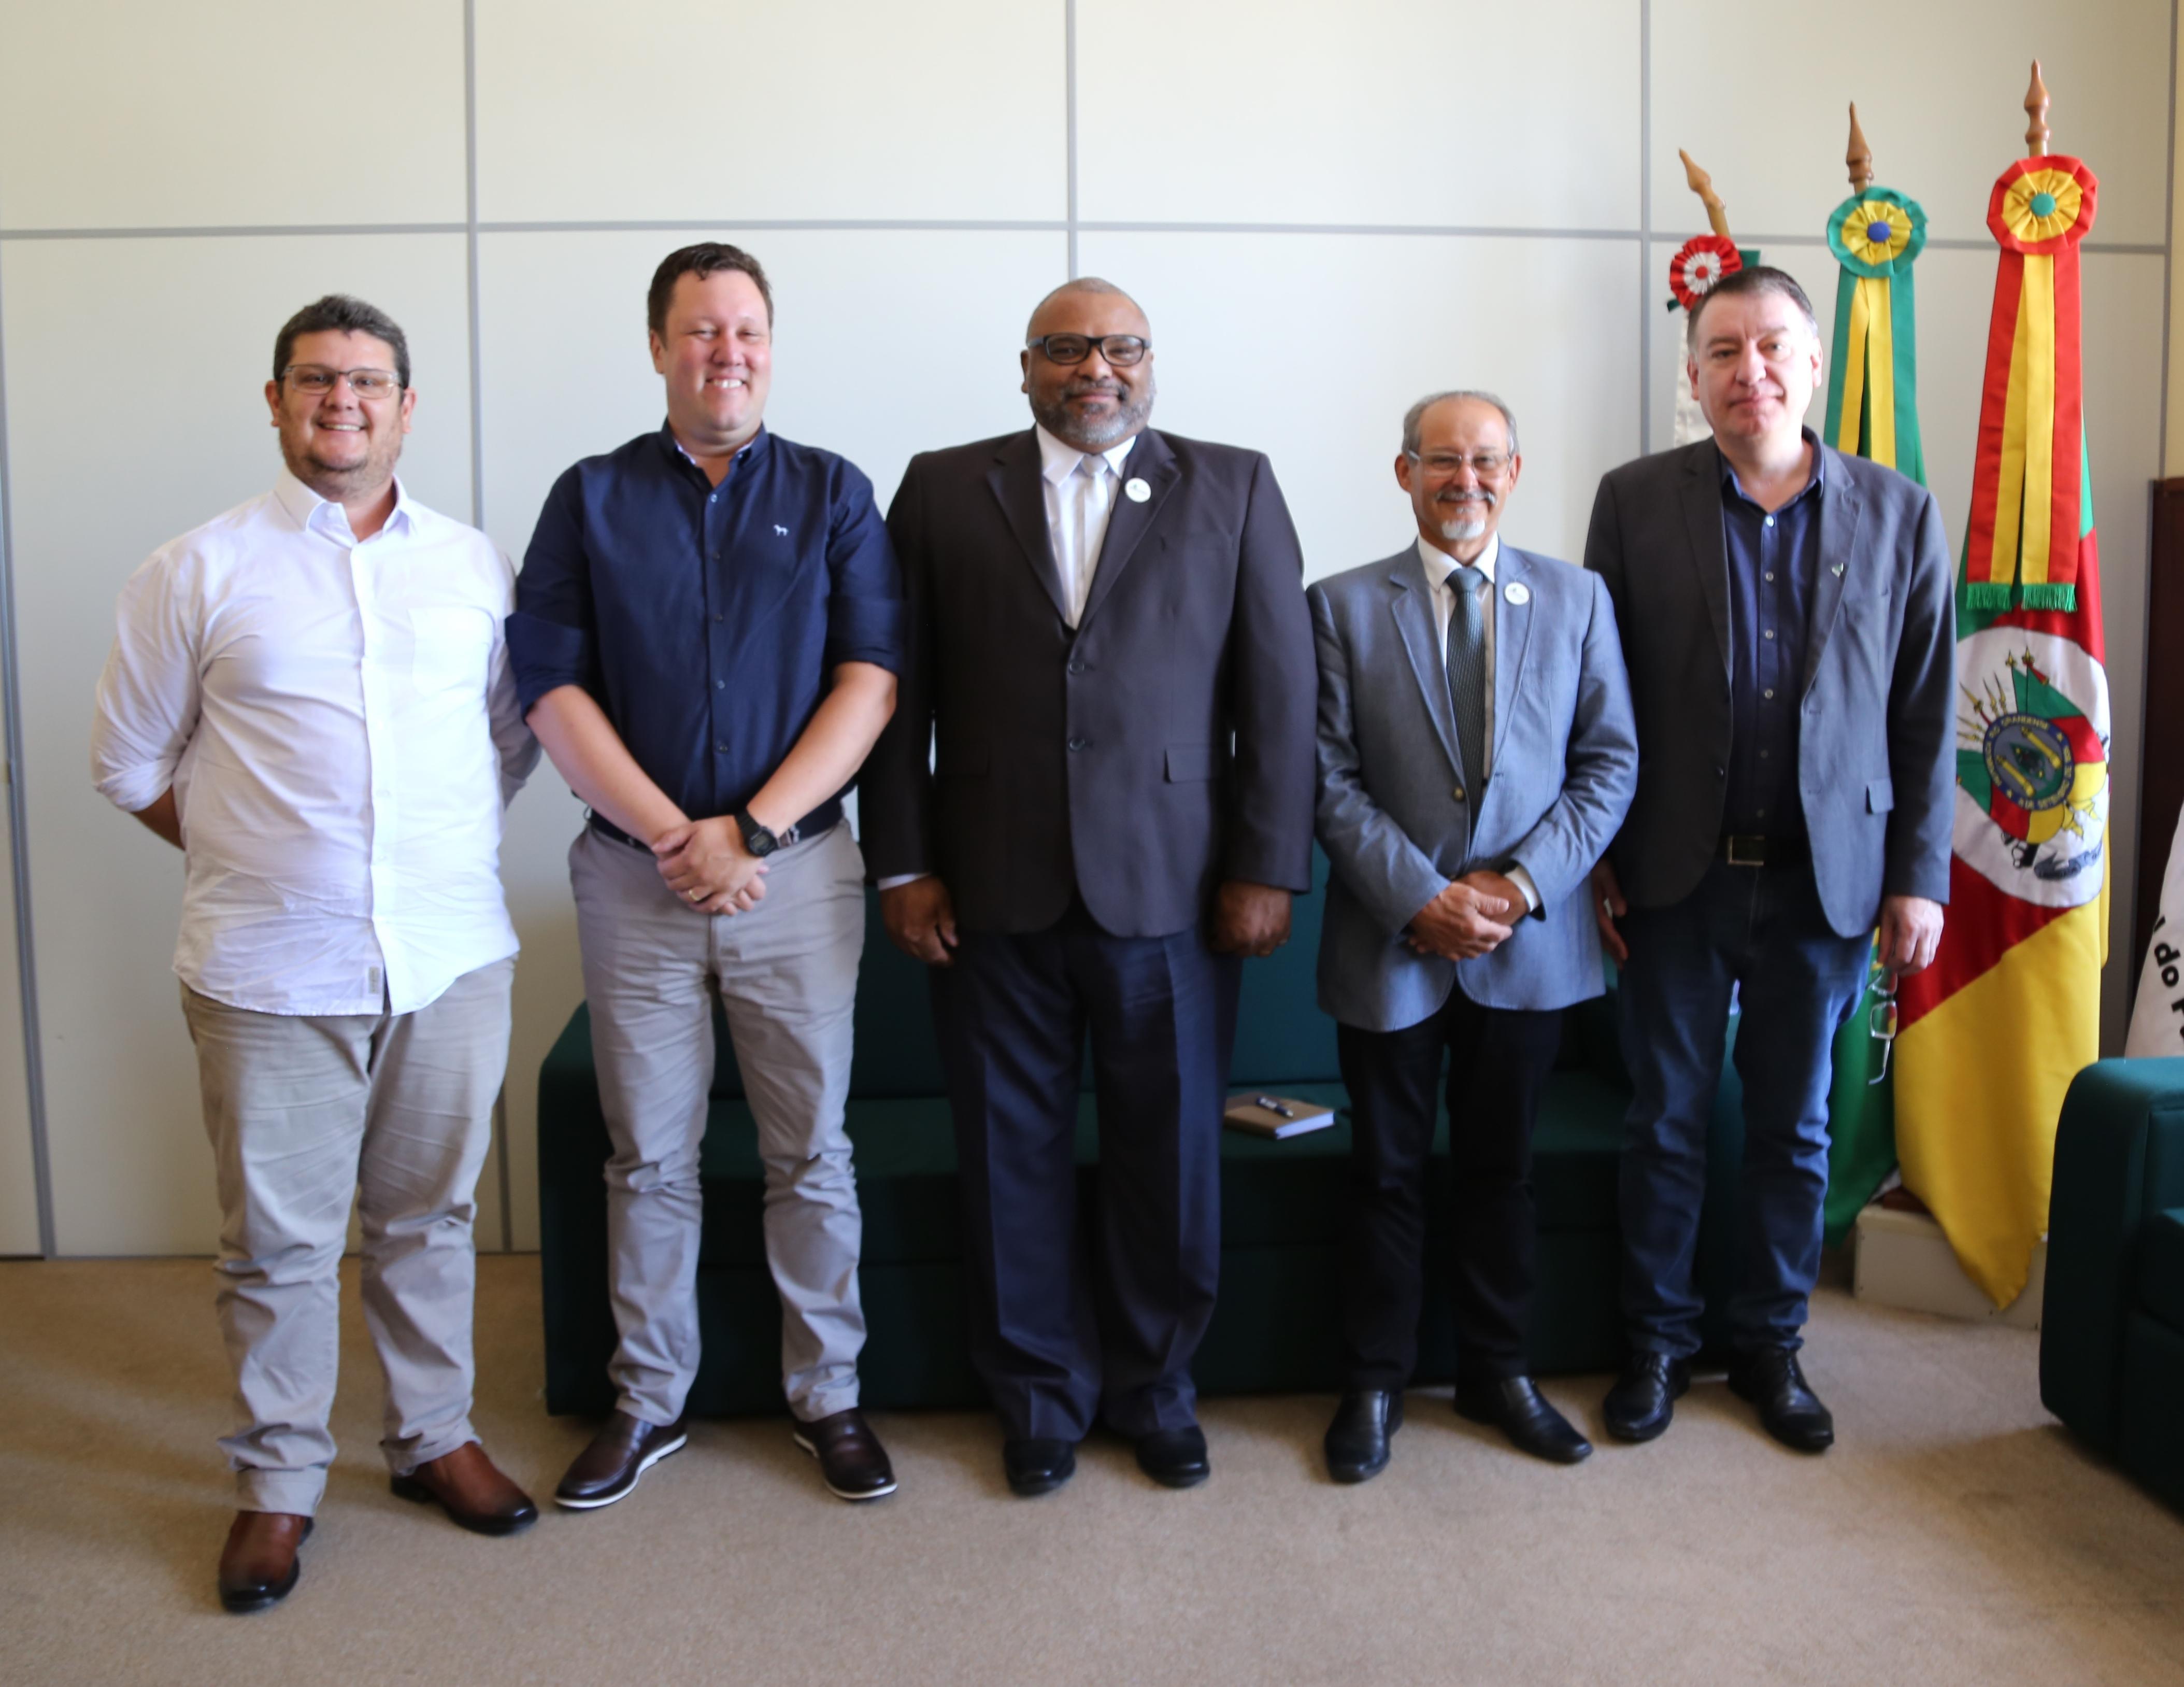 Unipampa e UFFS reúnem-se para tratar pautas interinstitucionais - Foto: Franceli Couto/Unipampa